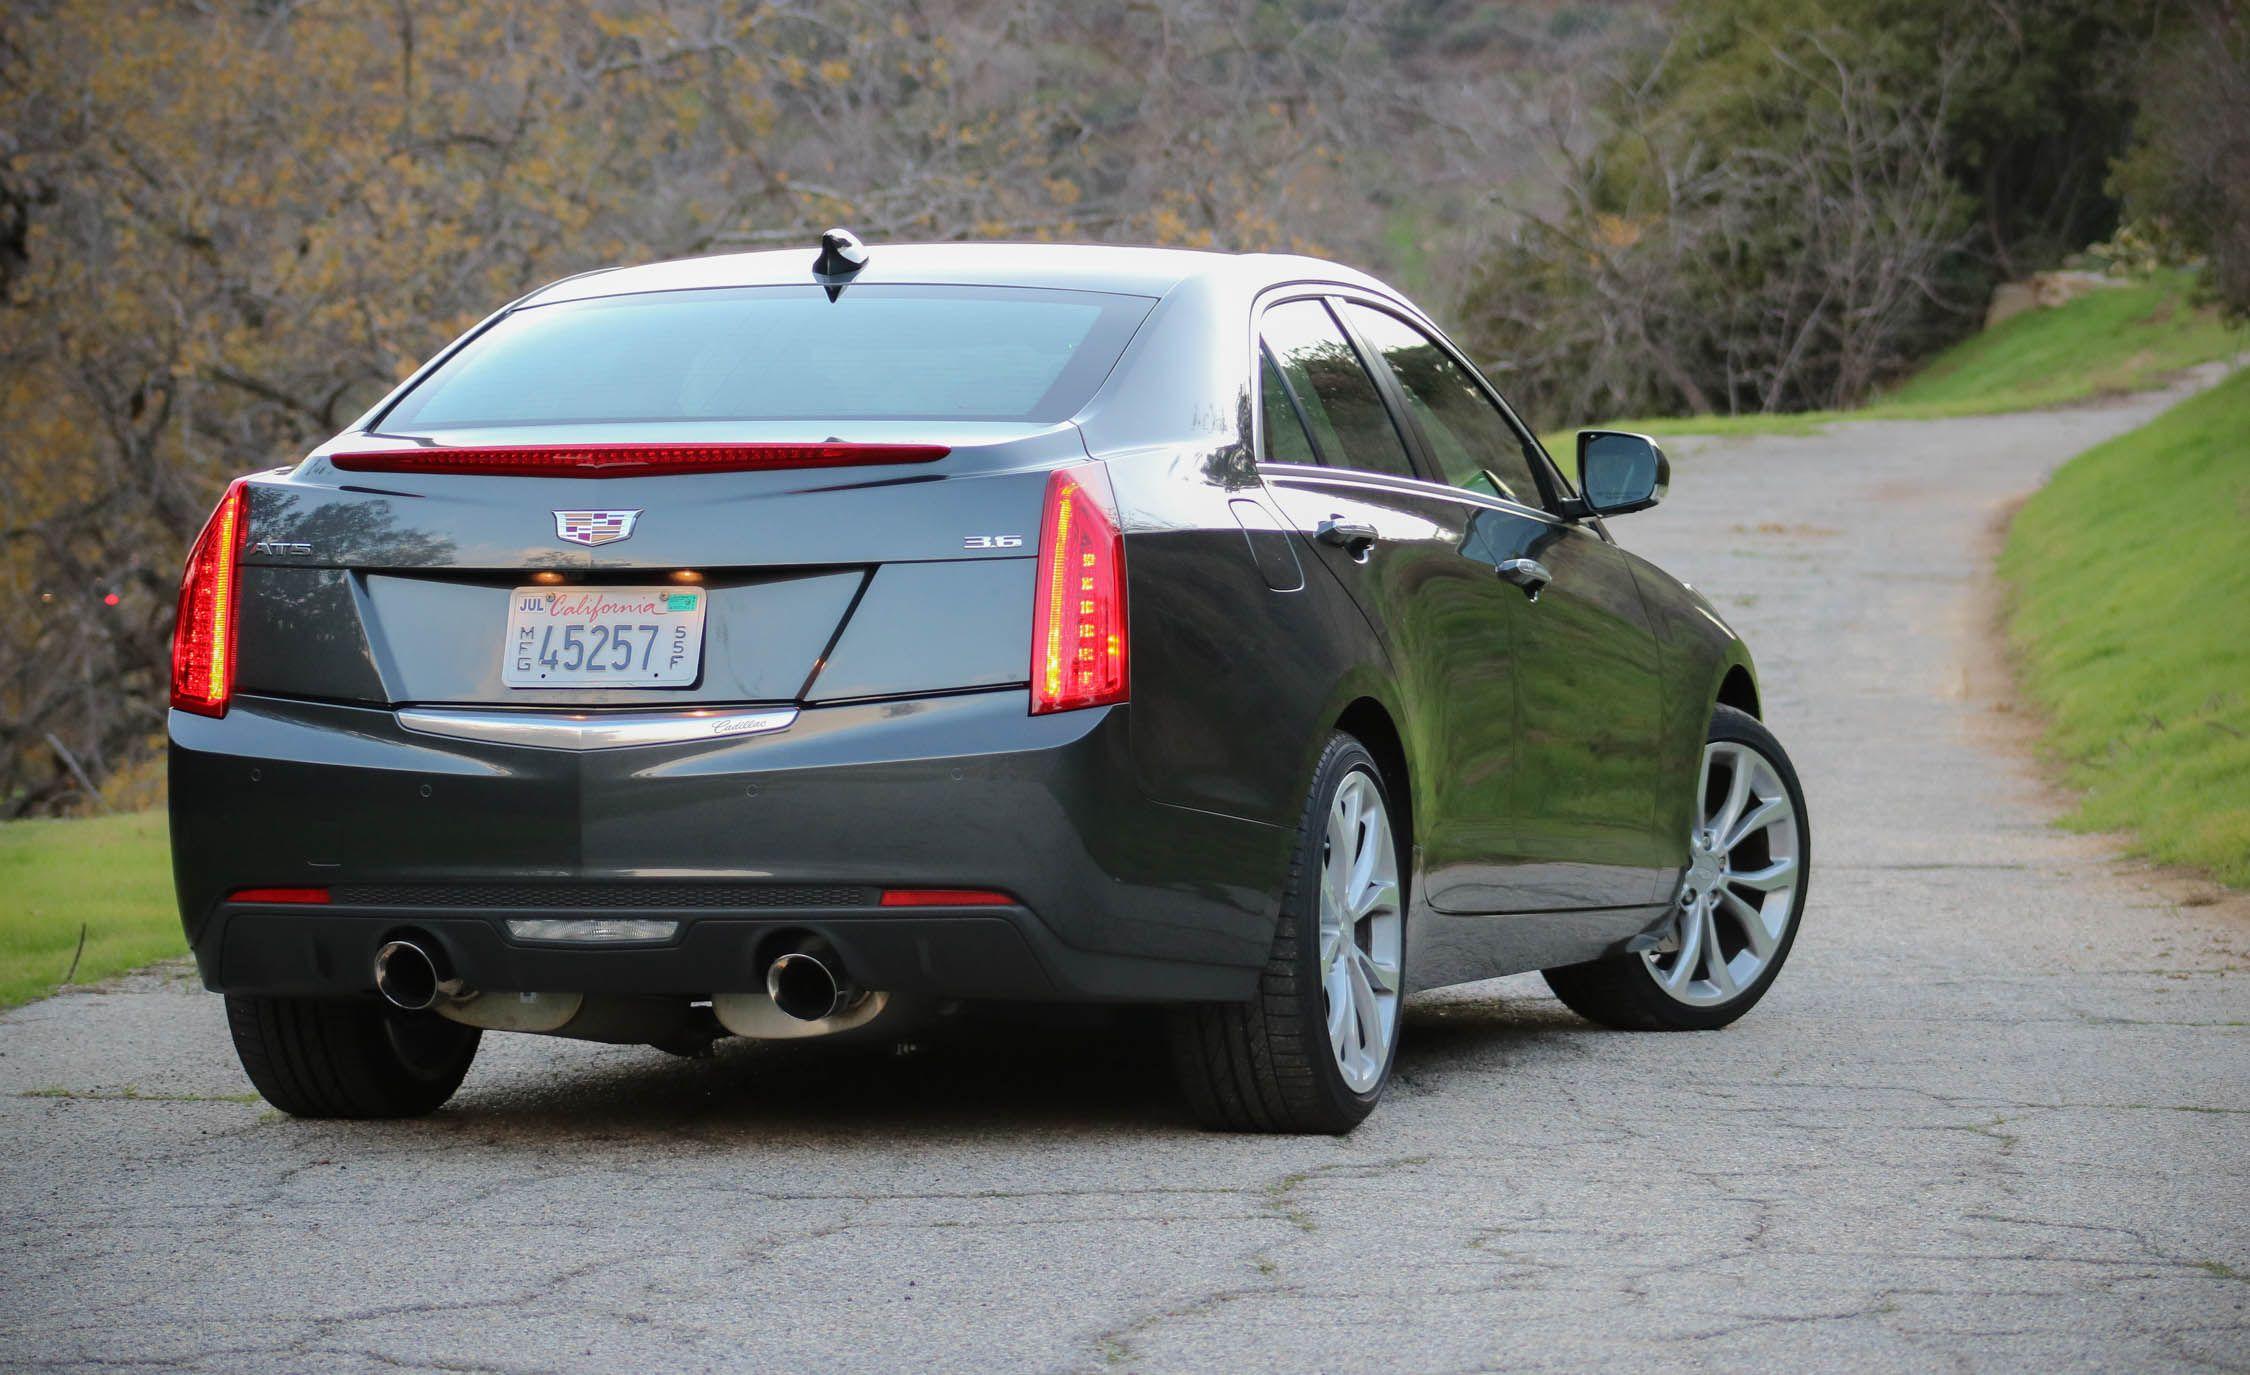 Cadillac ATS Reviews Cadillac ATS Price s and Specs